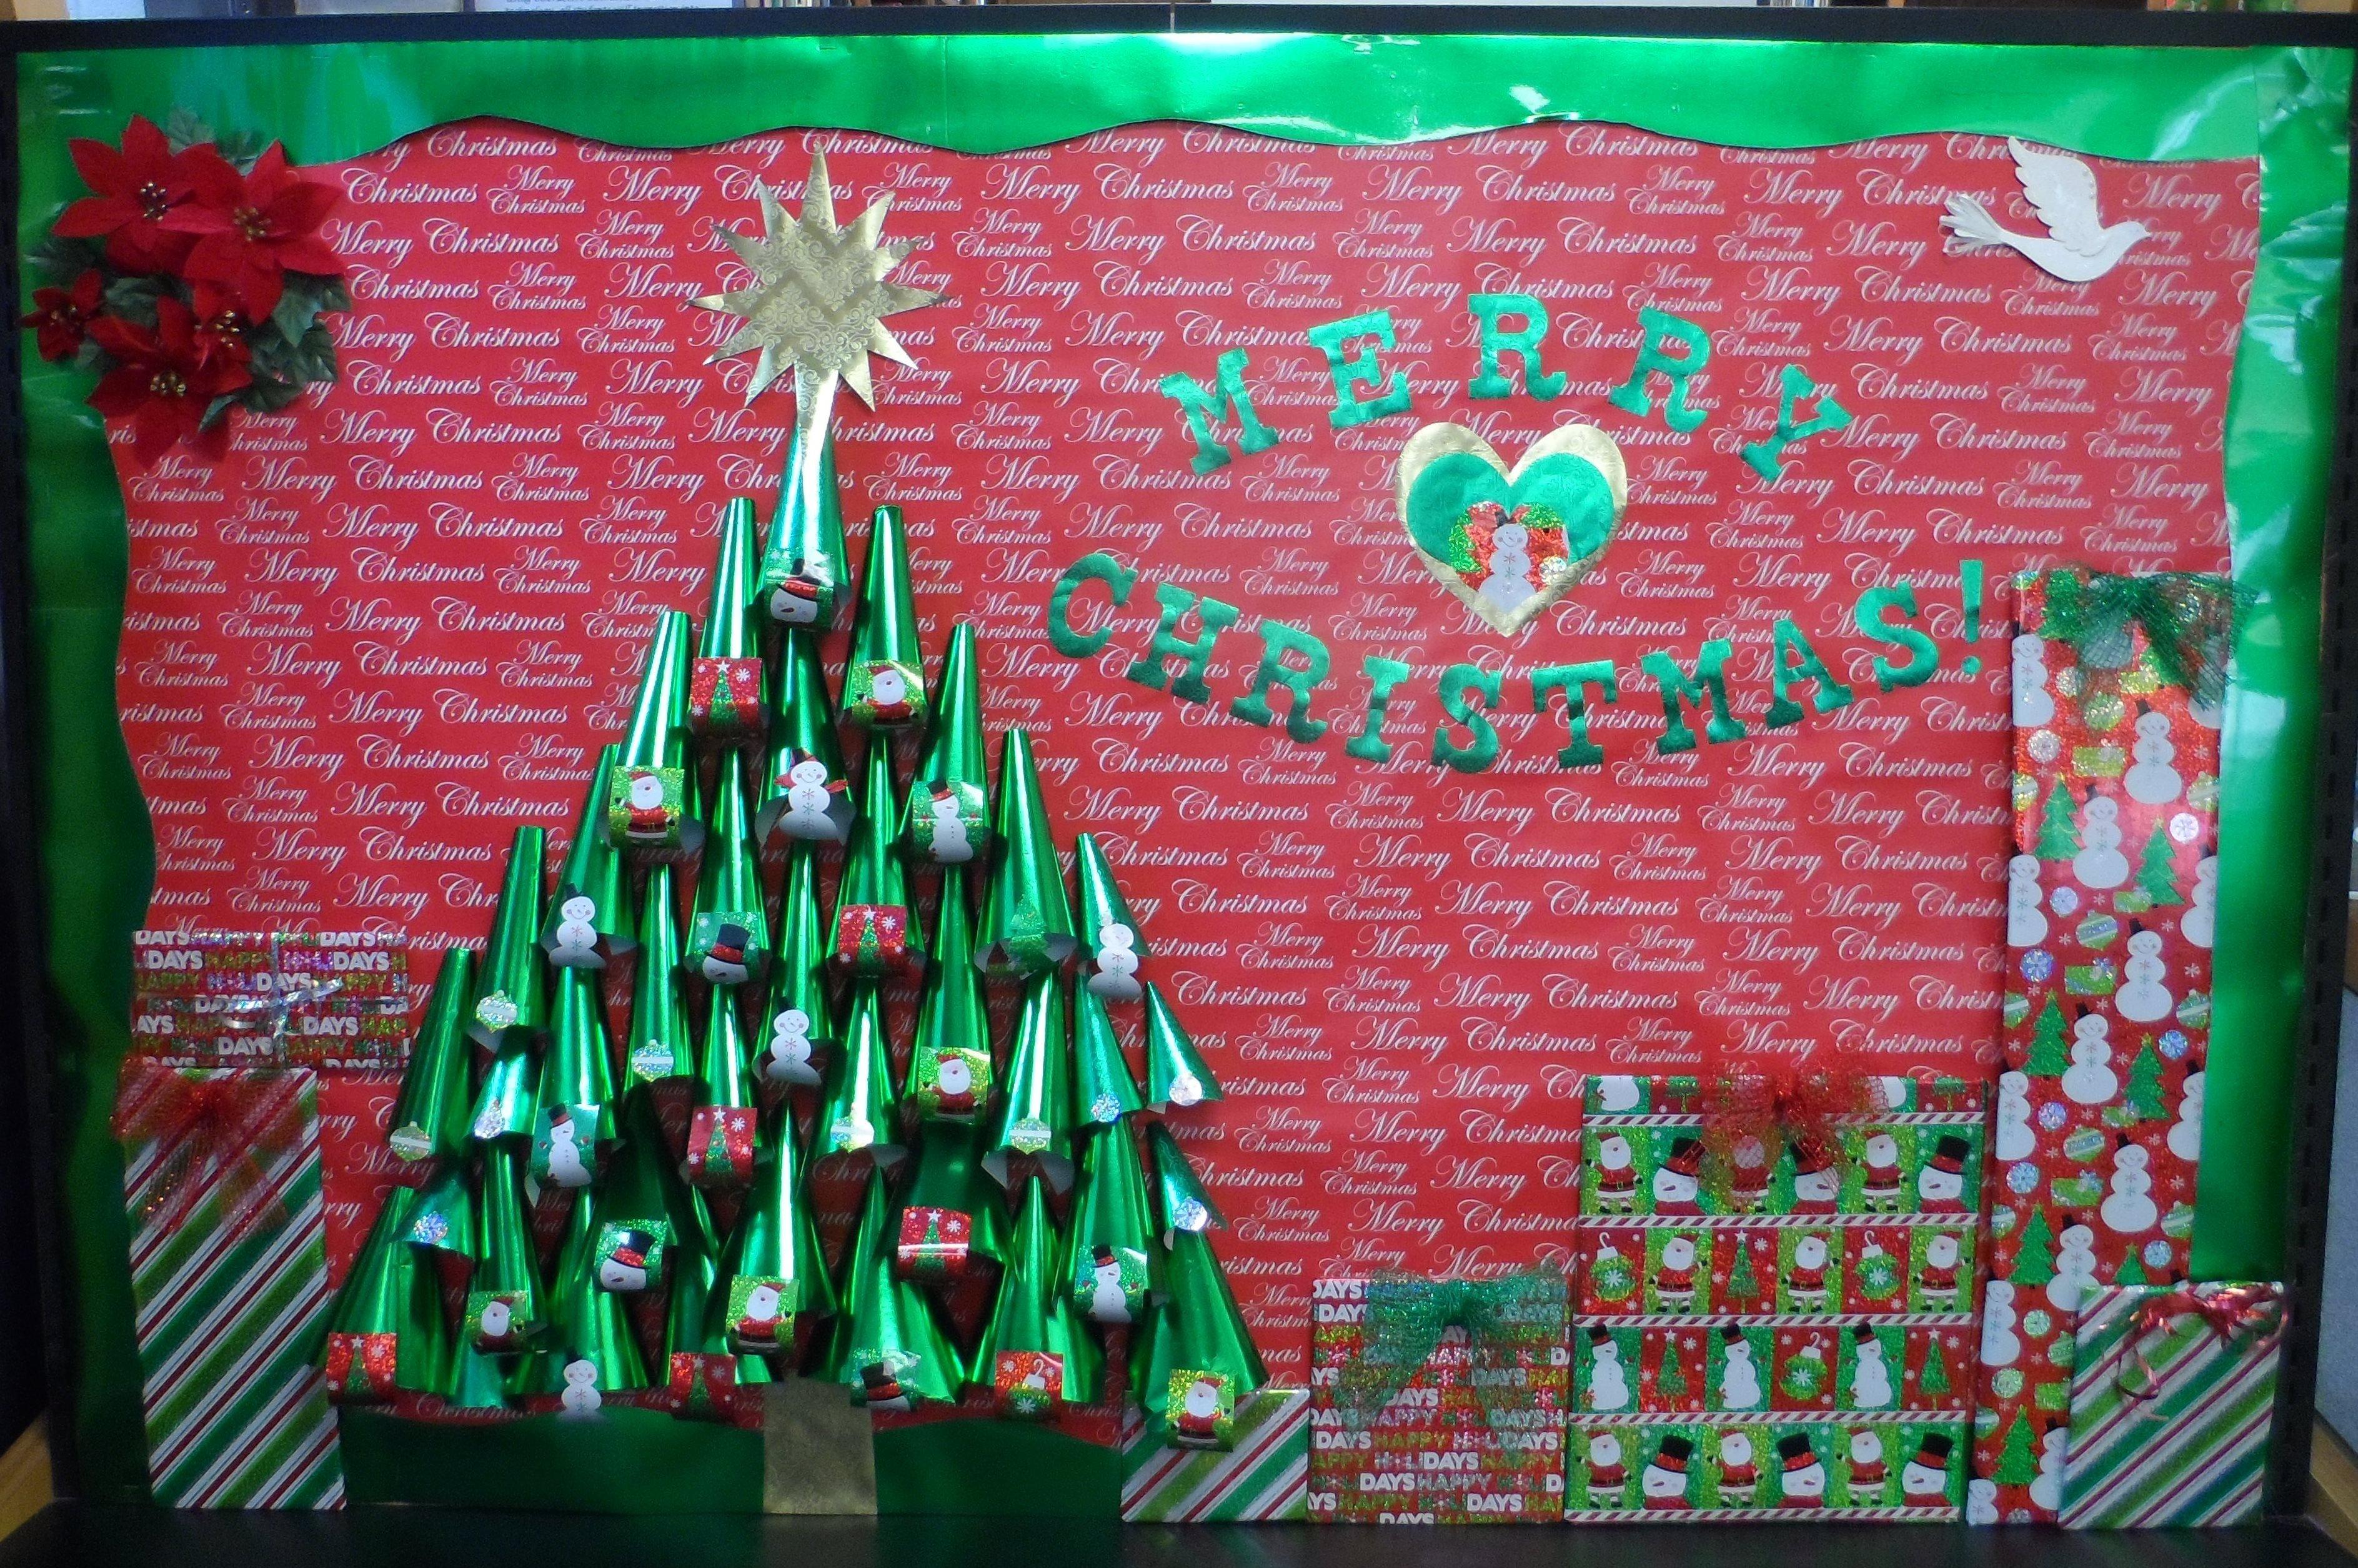 10 Attractive Christmas Tree Bulletin Board Ideas christmas bulletin board pics4learning 2021